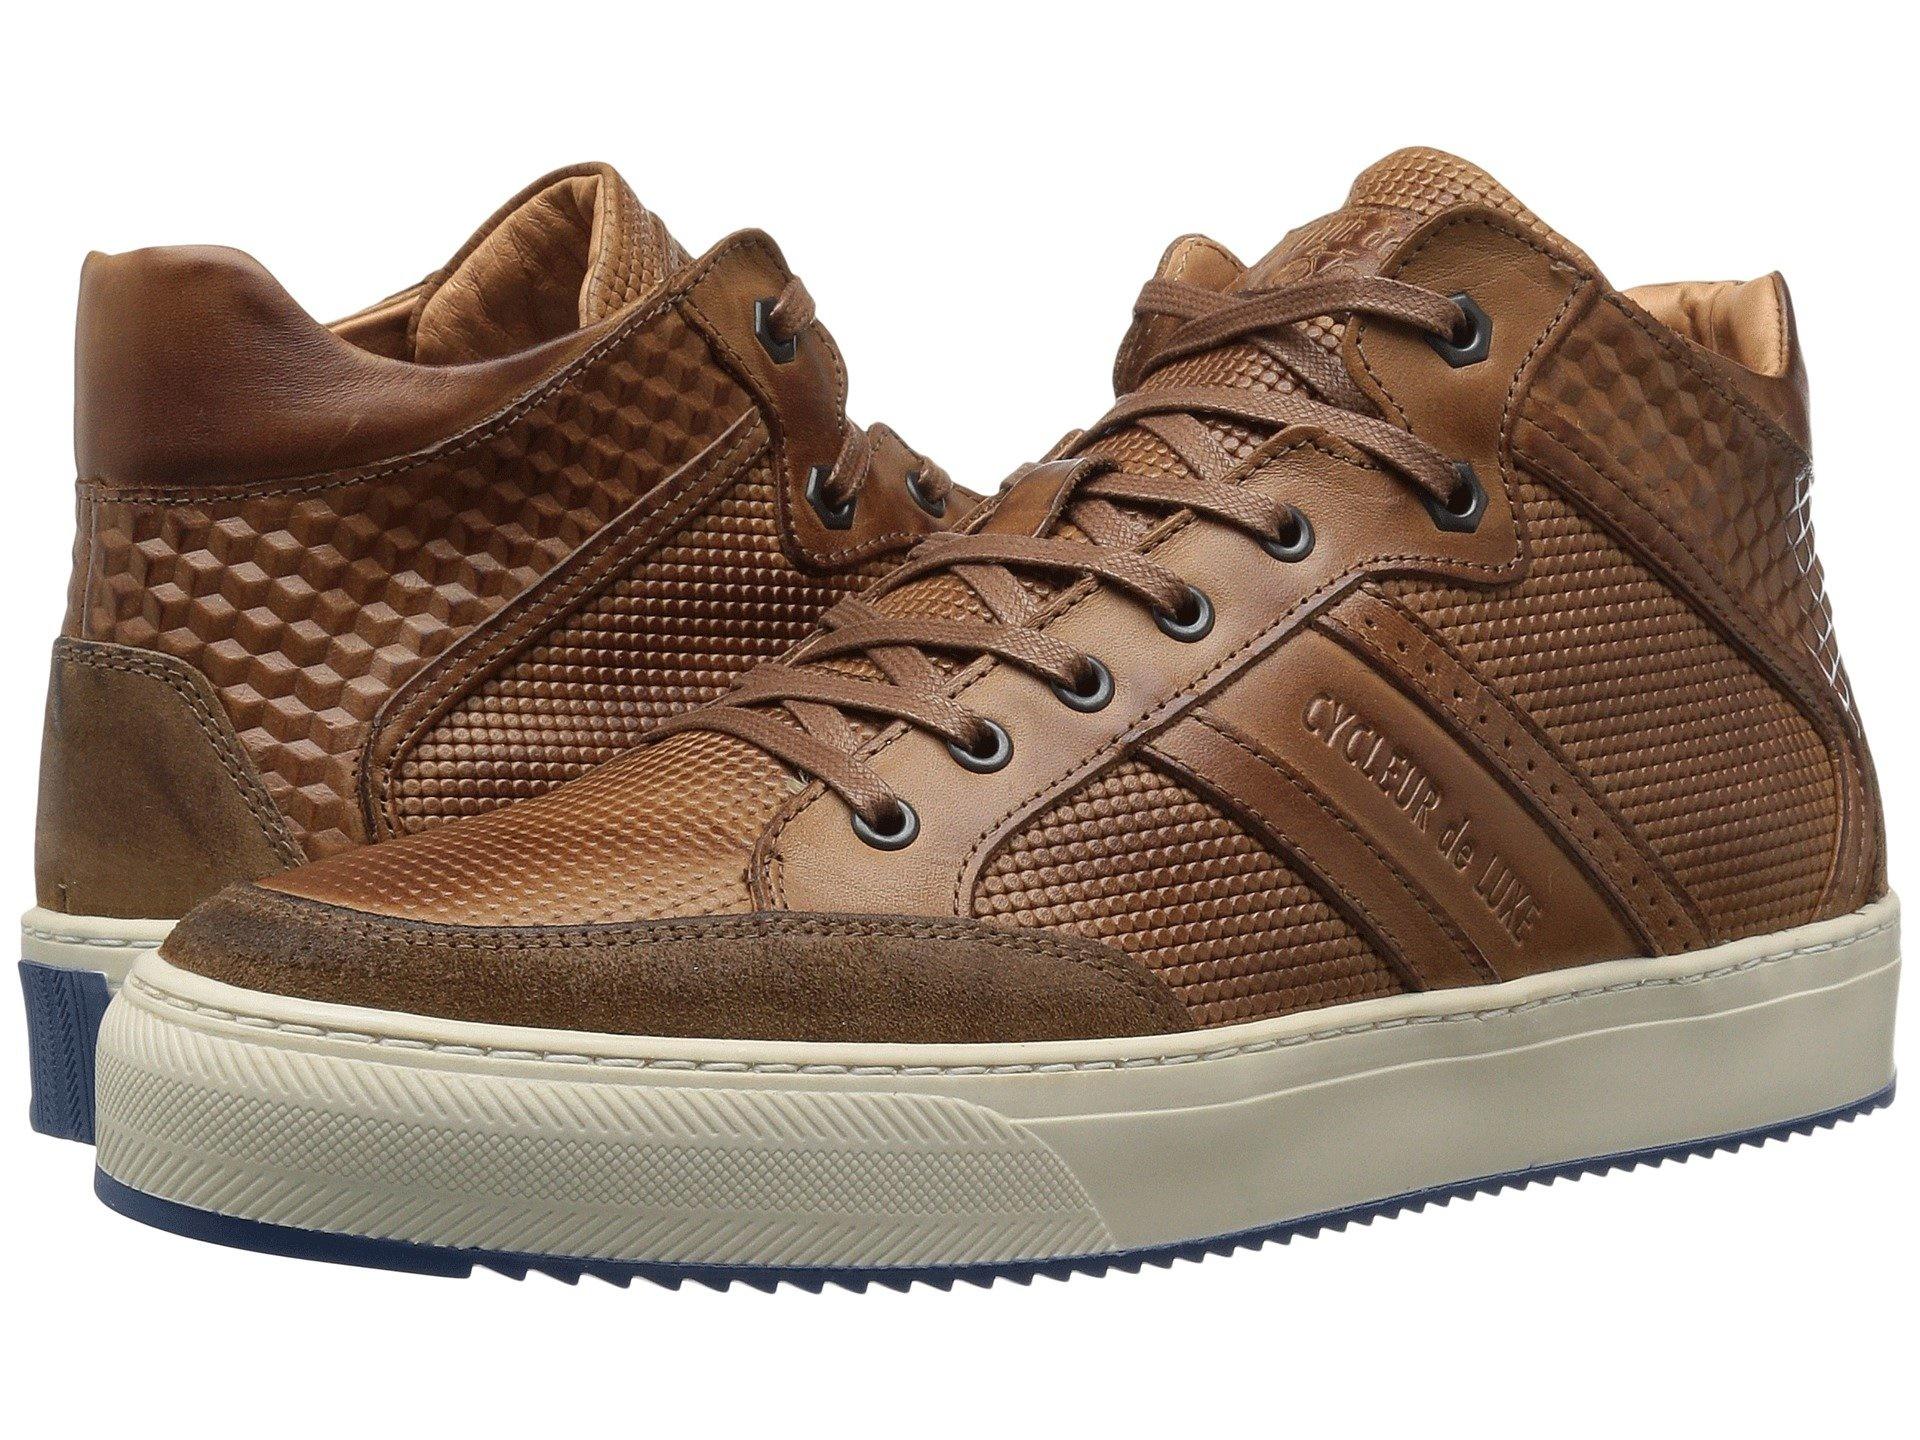 87cd02a992c7 Qoo10 - Cycleur de Luxe Hurley   Shoes